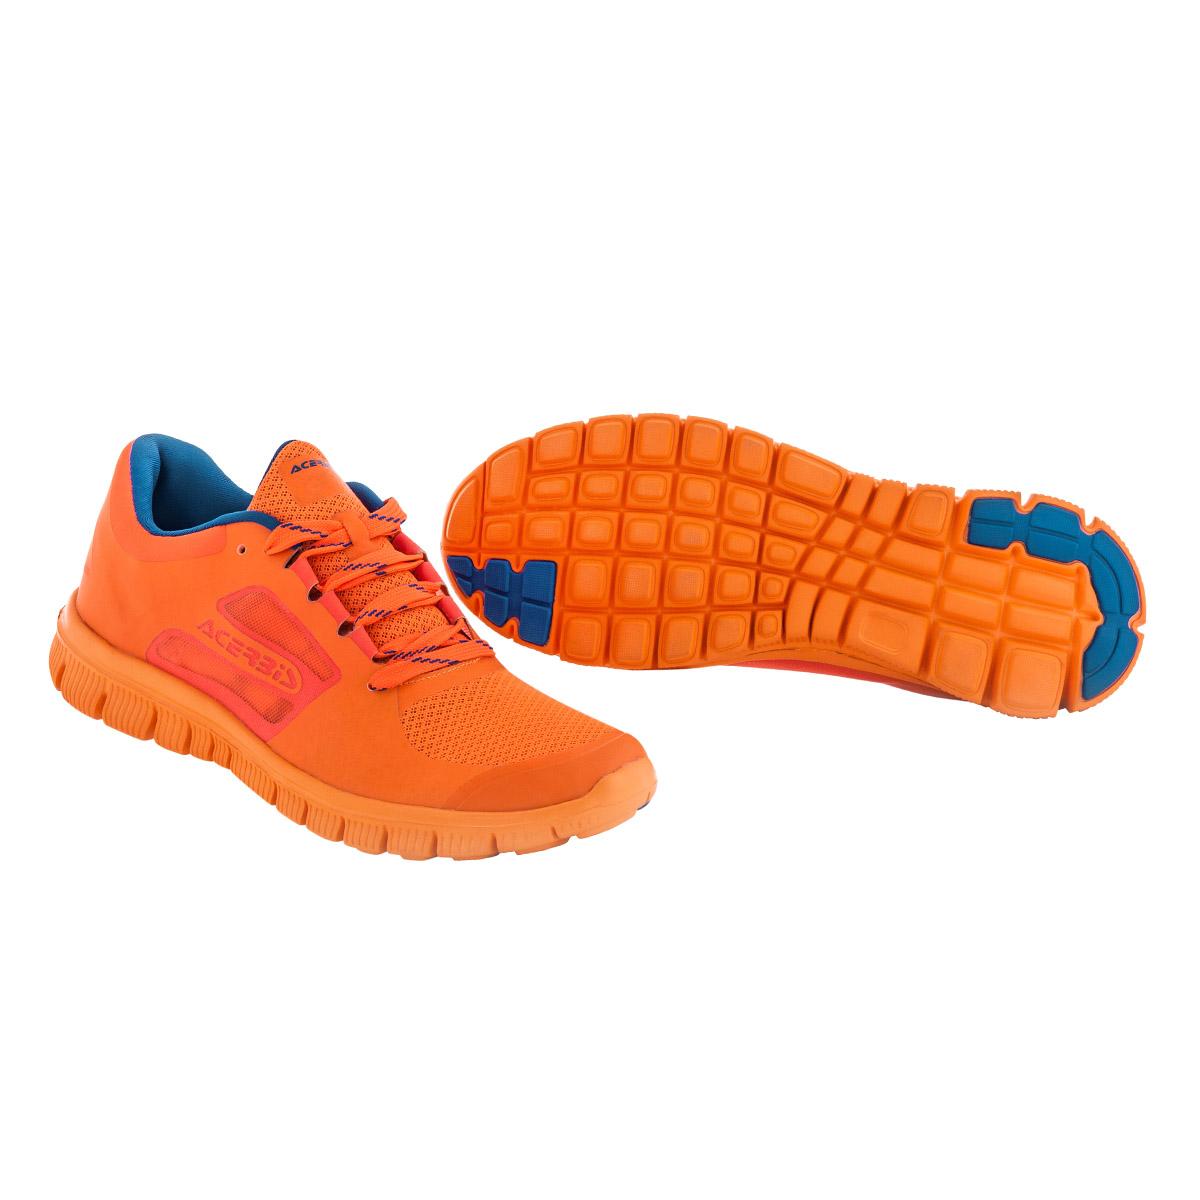 Acerbis Laufschuhe Corporate Fluo Orange